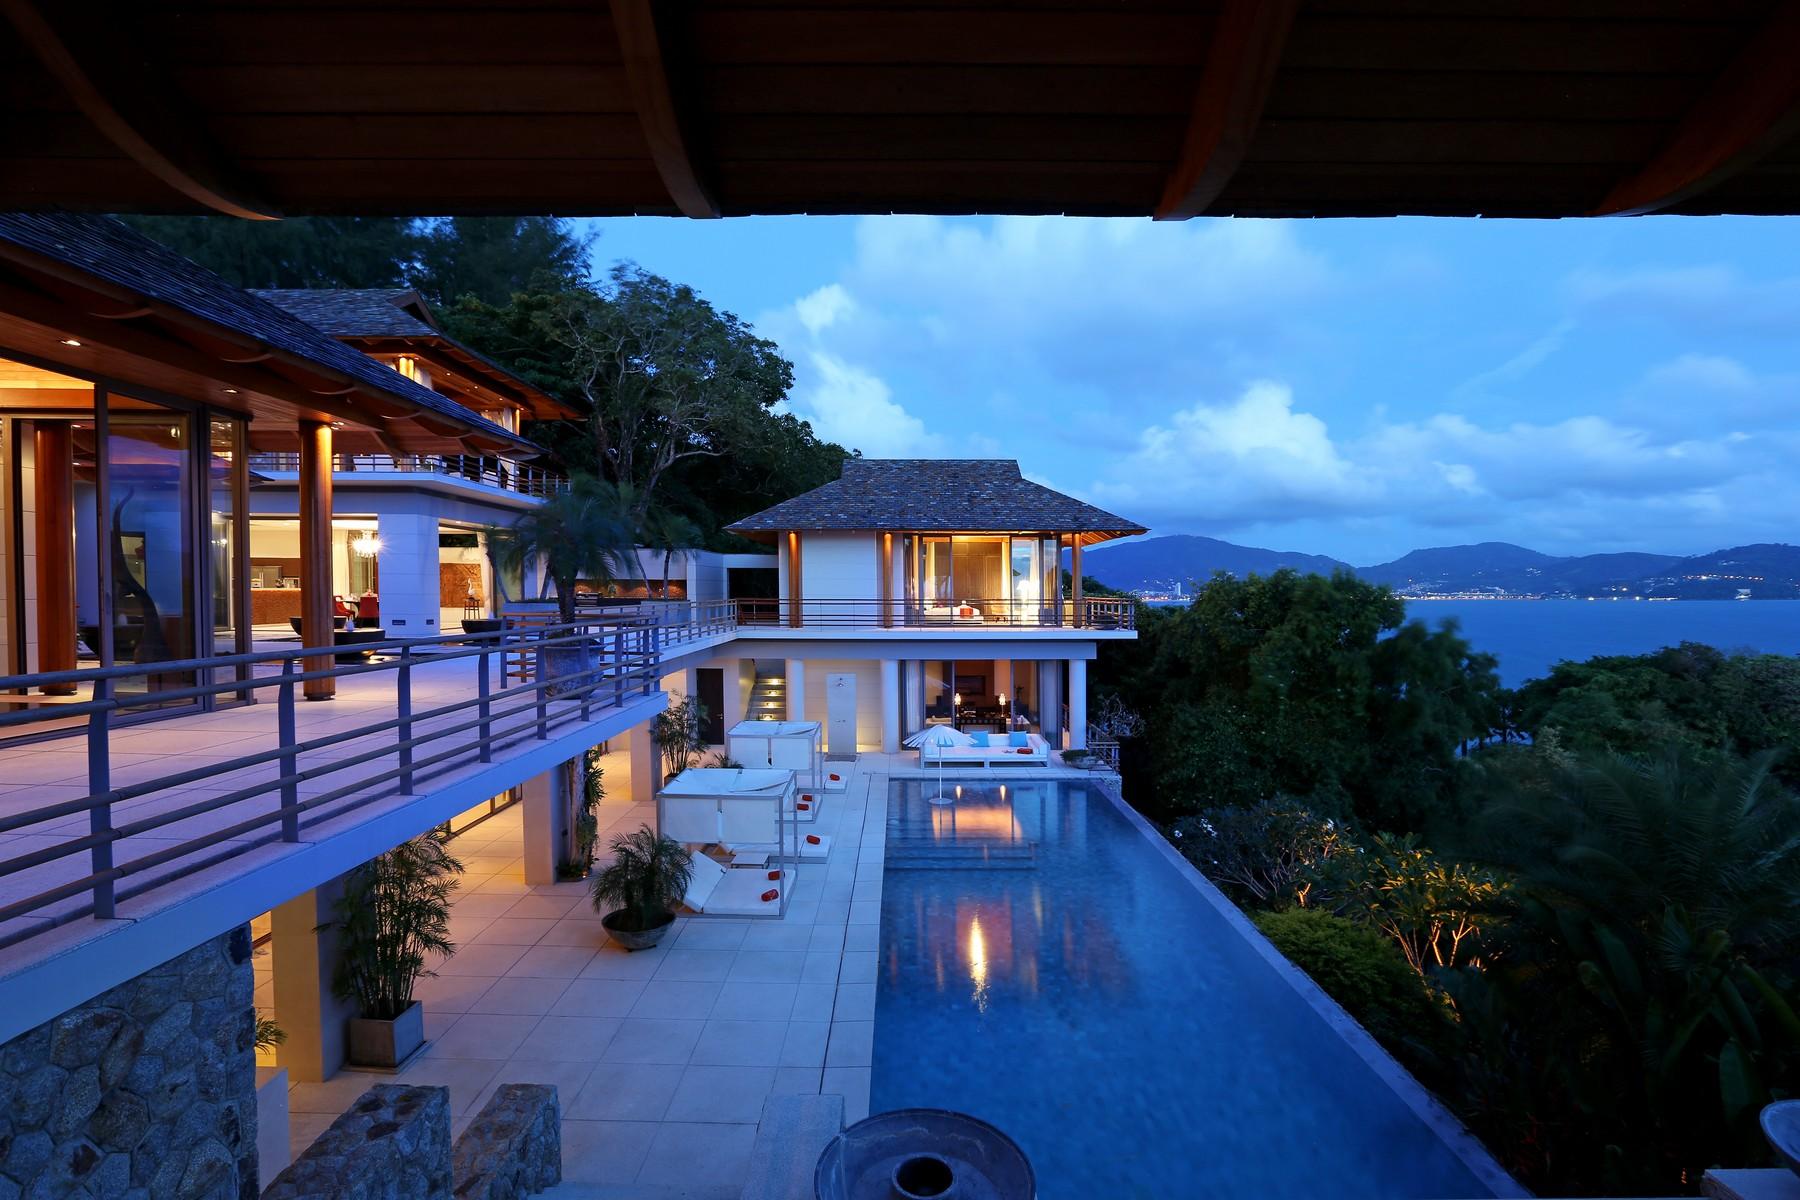 出色时尚的海景别墅, outstandingly stylish ocean view villa